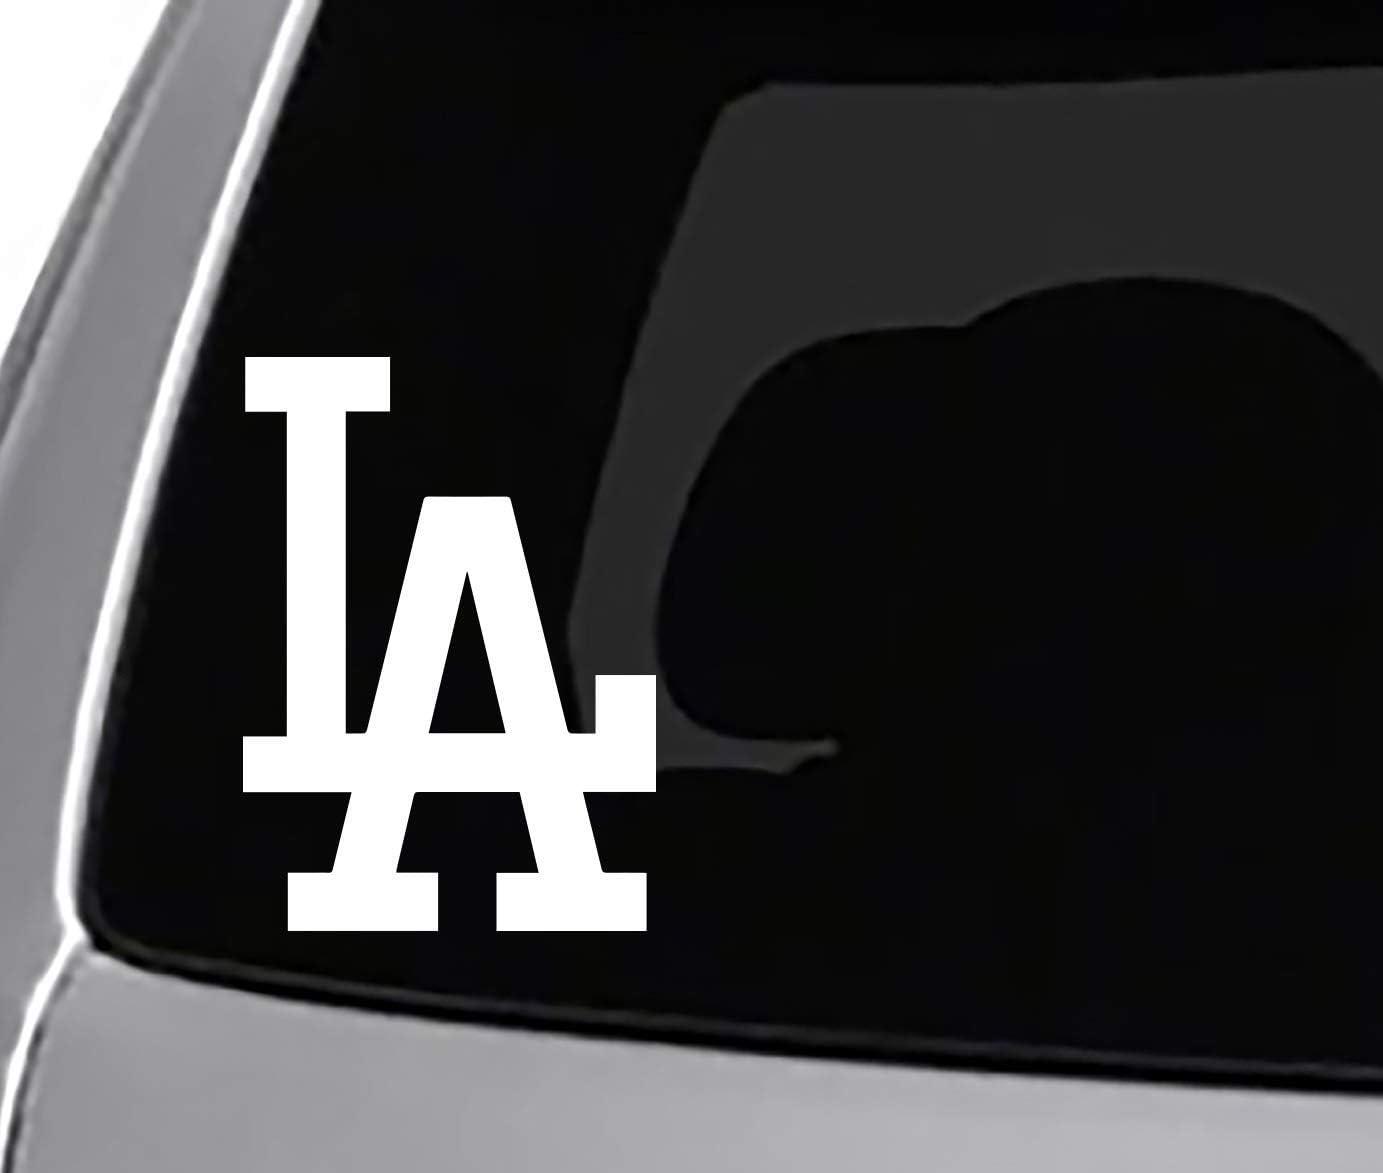 LA DODGERS DECAL CAR TRUCK WINDOW BUMPER STICKER SPORTS BASKETBALL